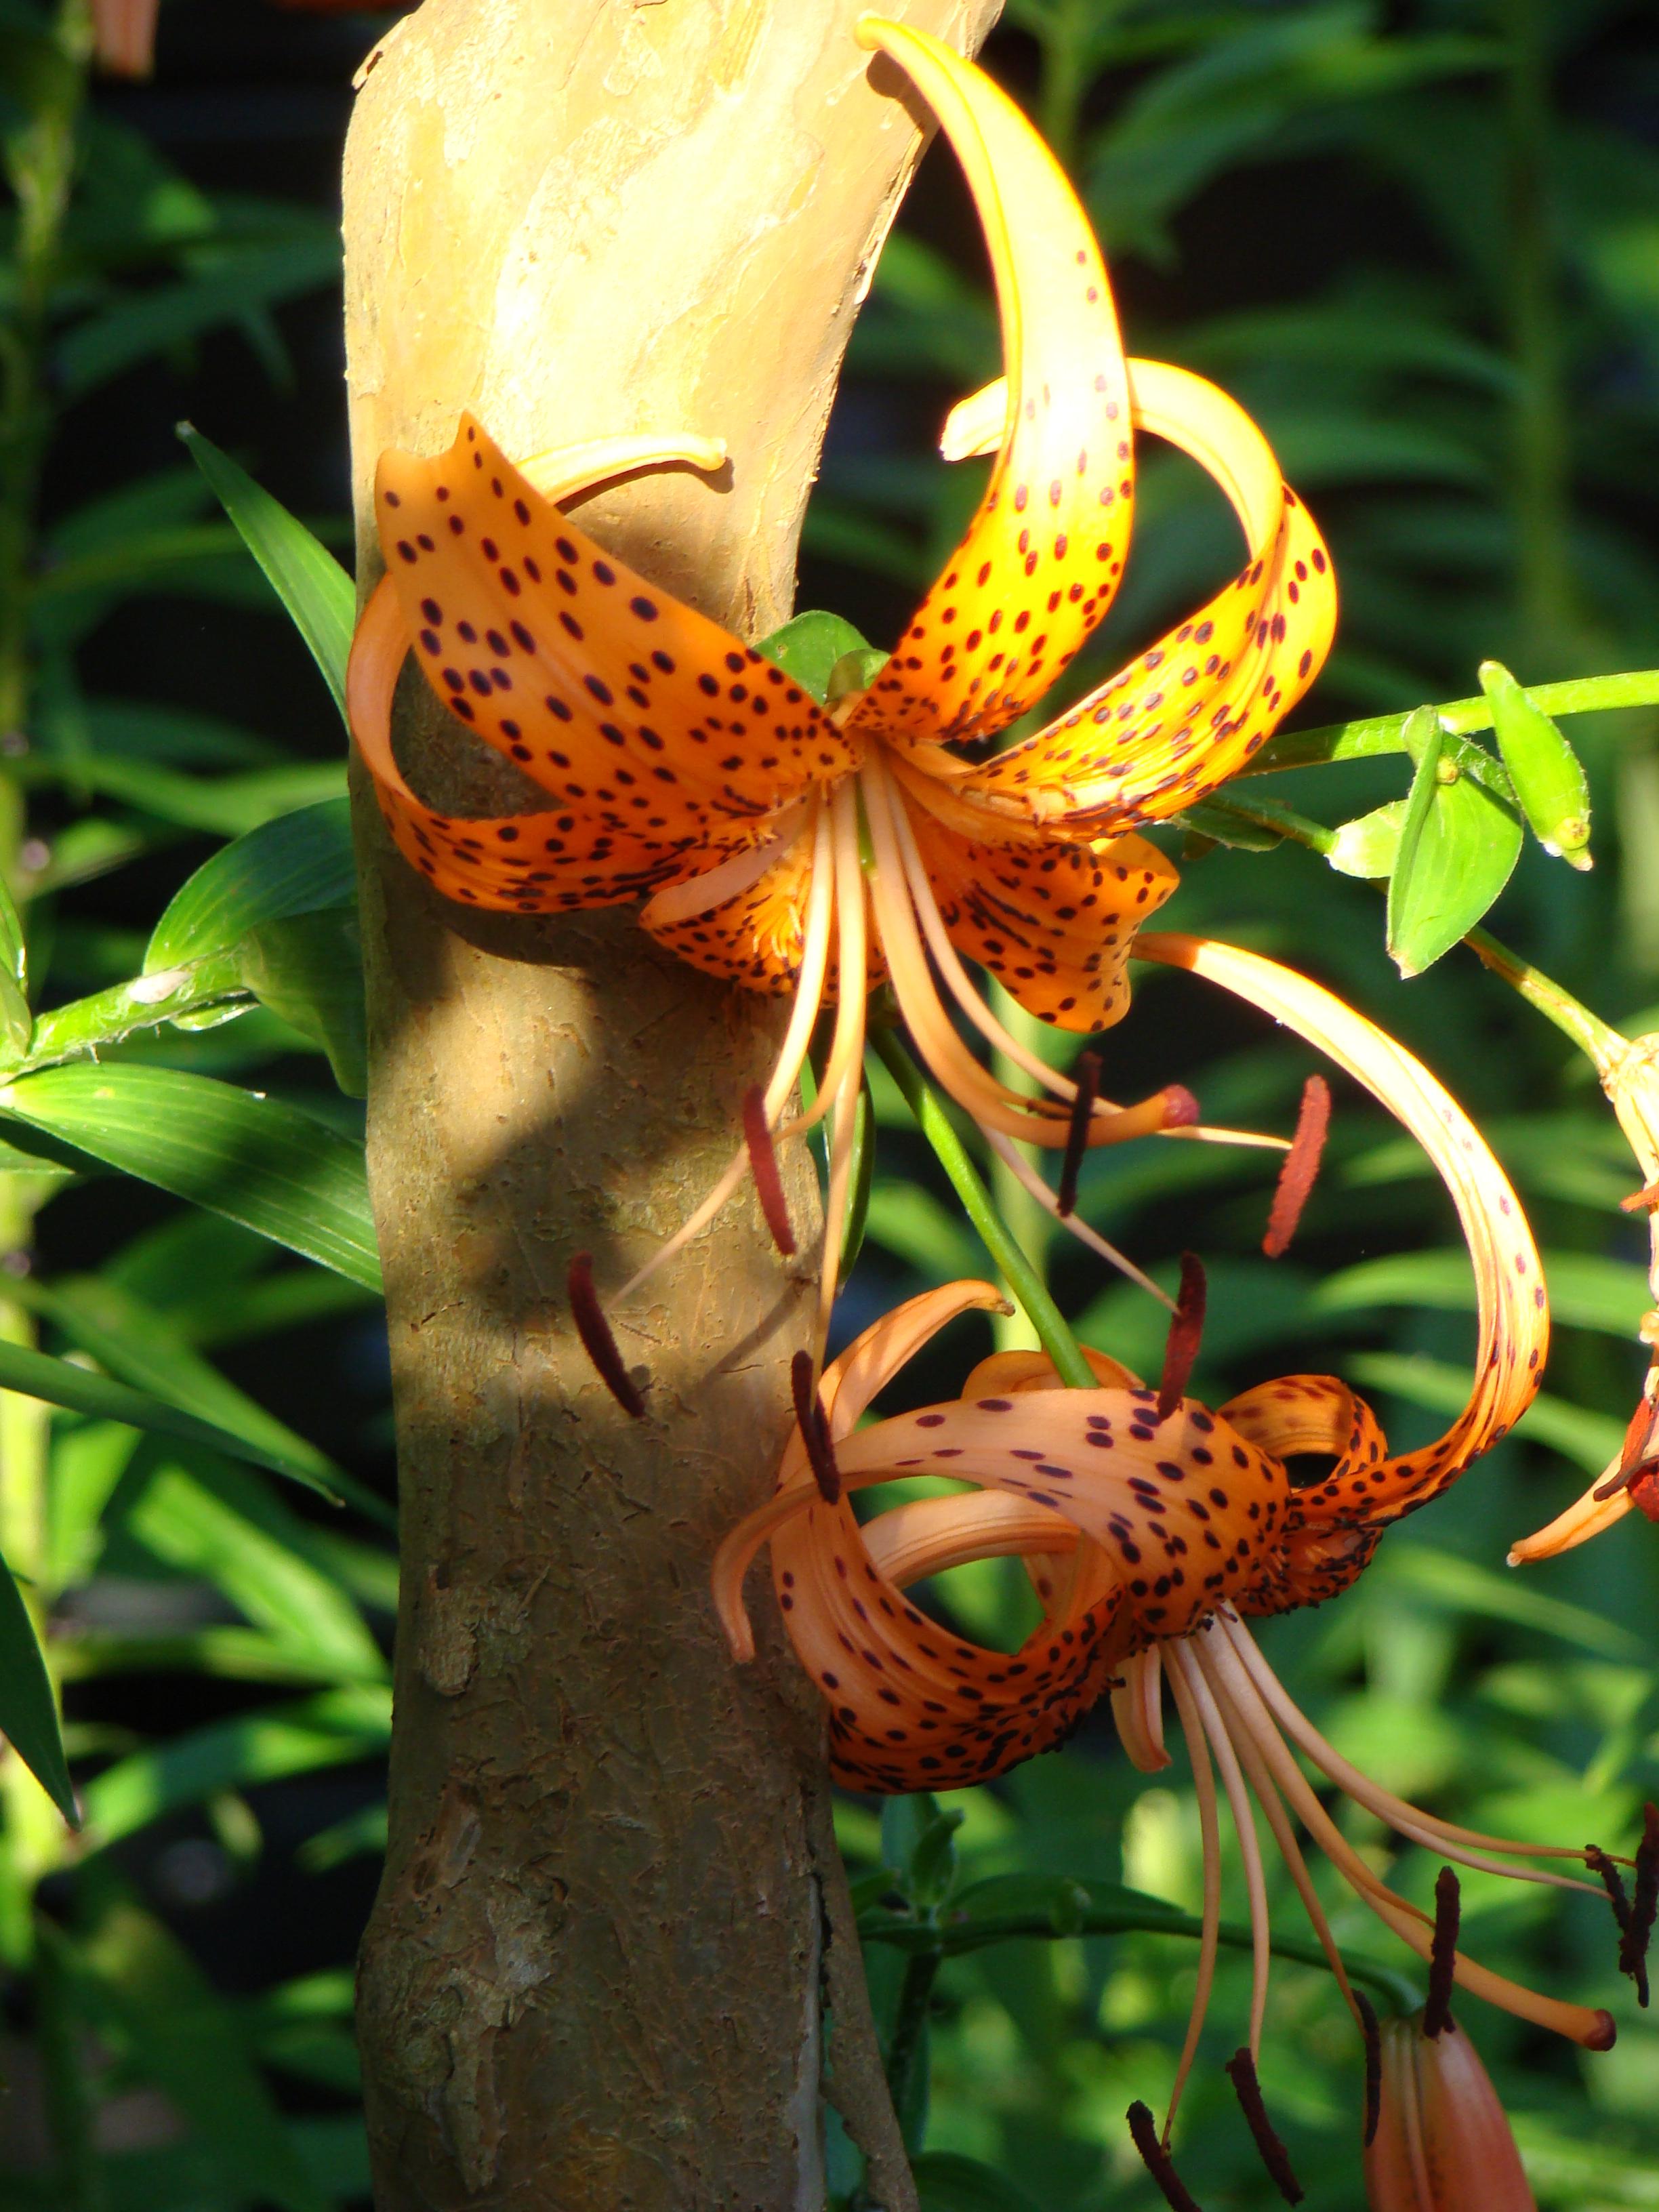 tiger lillies on a tree